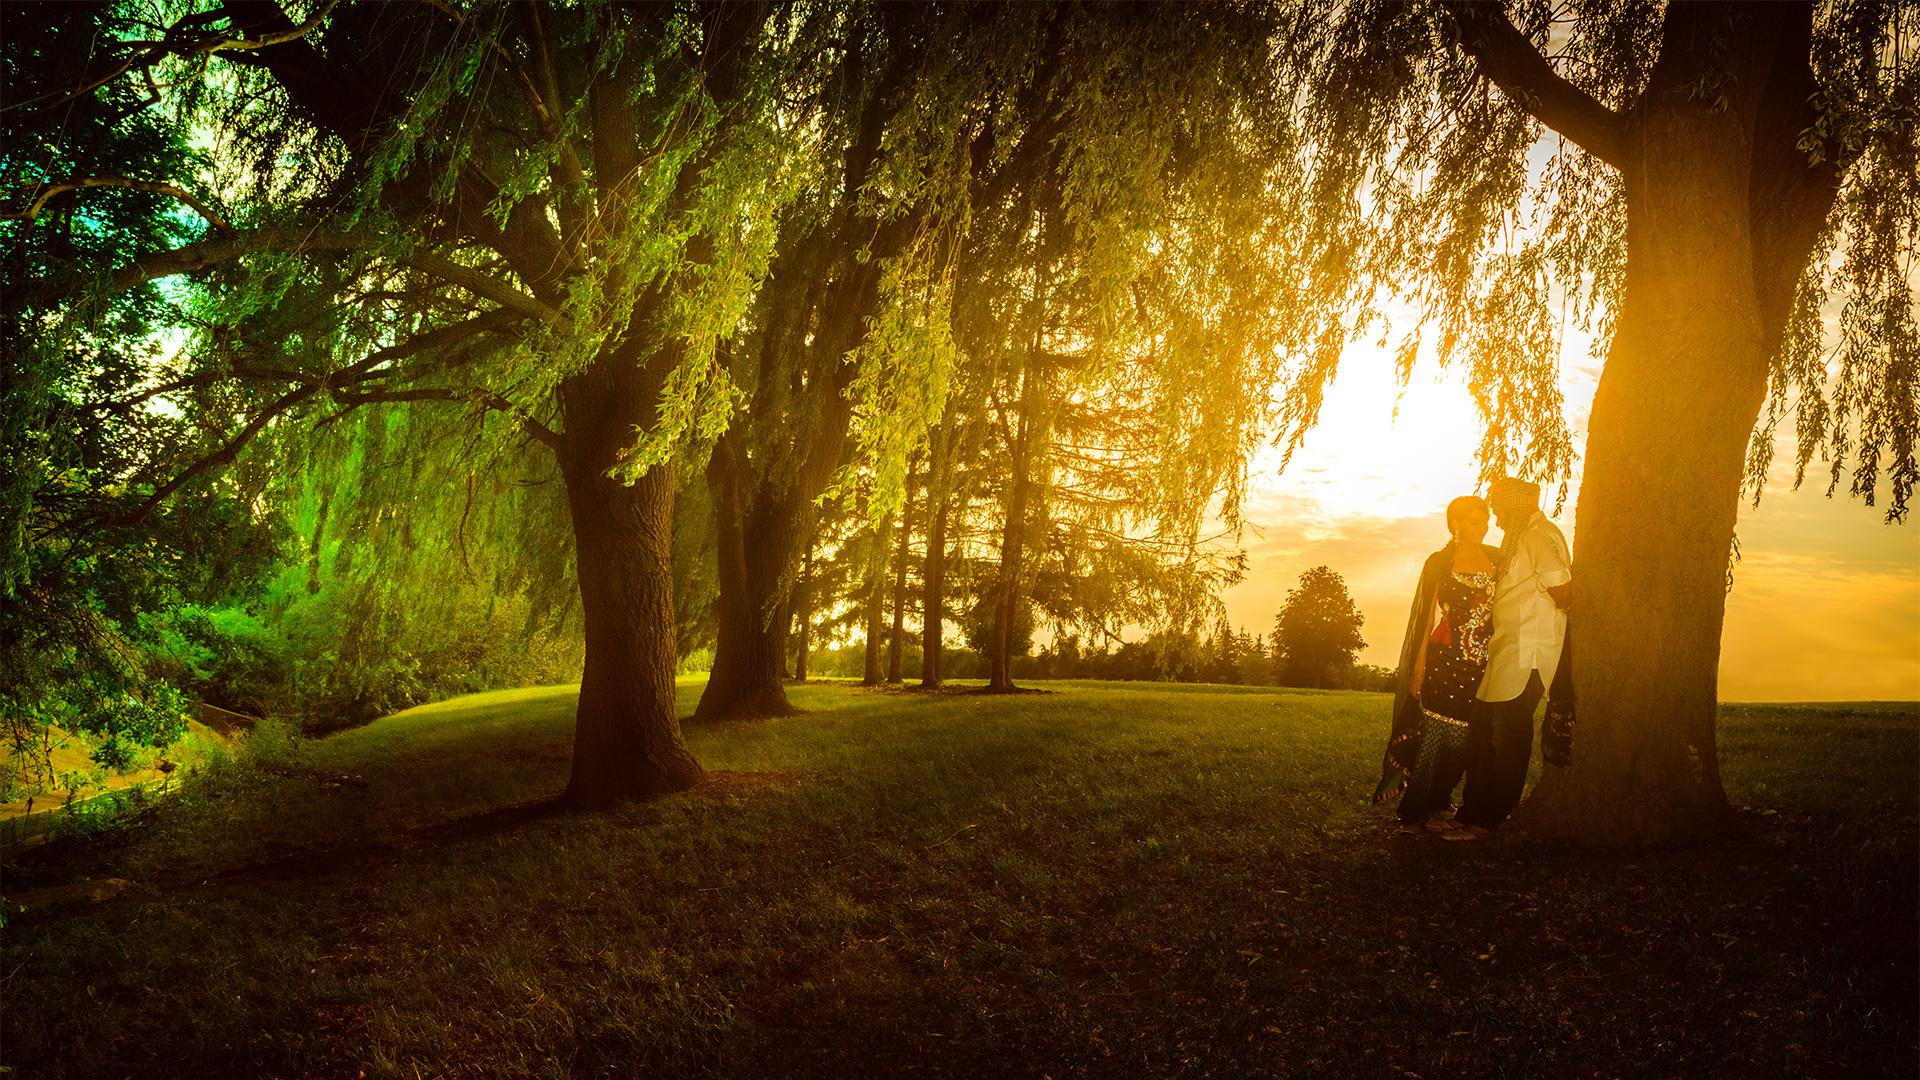 epicskypictures_epicsky_wedding_photography_services_stoney_creek_mississauga_burlington_brampton_eshoot_punjabi_ceremony_sunset_tree_bride_love_story_romantic_pics_photos_images_novel_1920